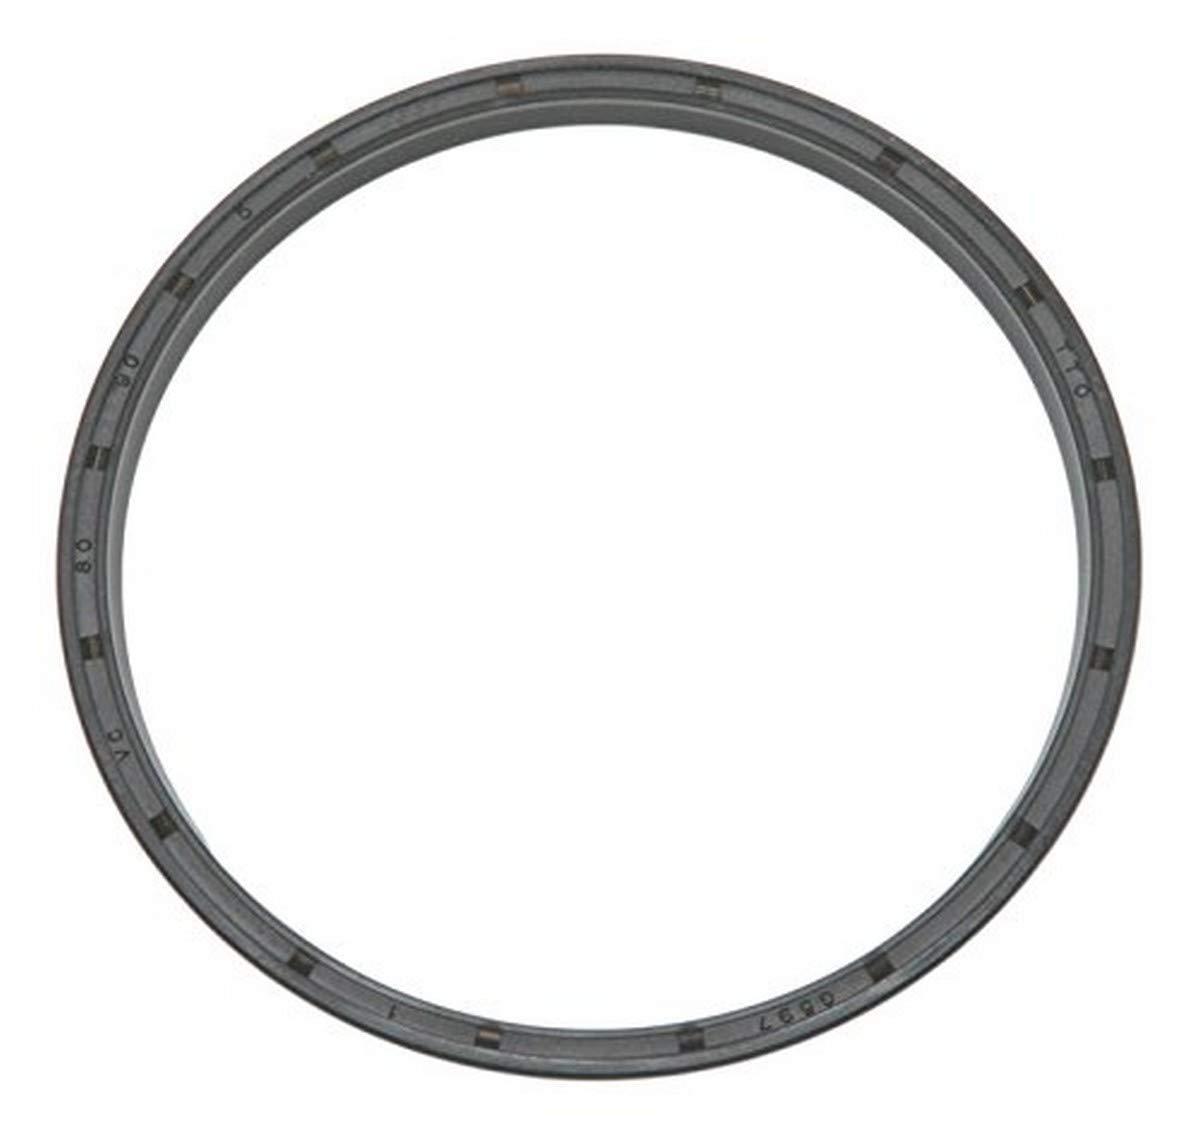 TCM 05082VSCW-BX NBR //Carbon Steel VSCW Type Oil Seal Buna Rubber 0.500 x 0.875 x 0.250